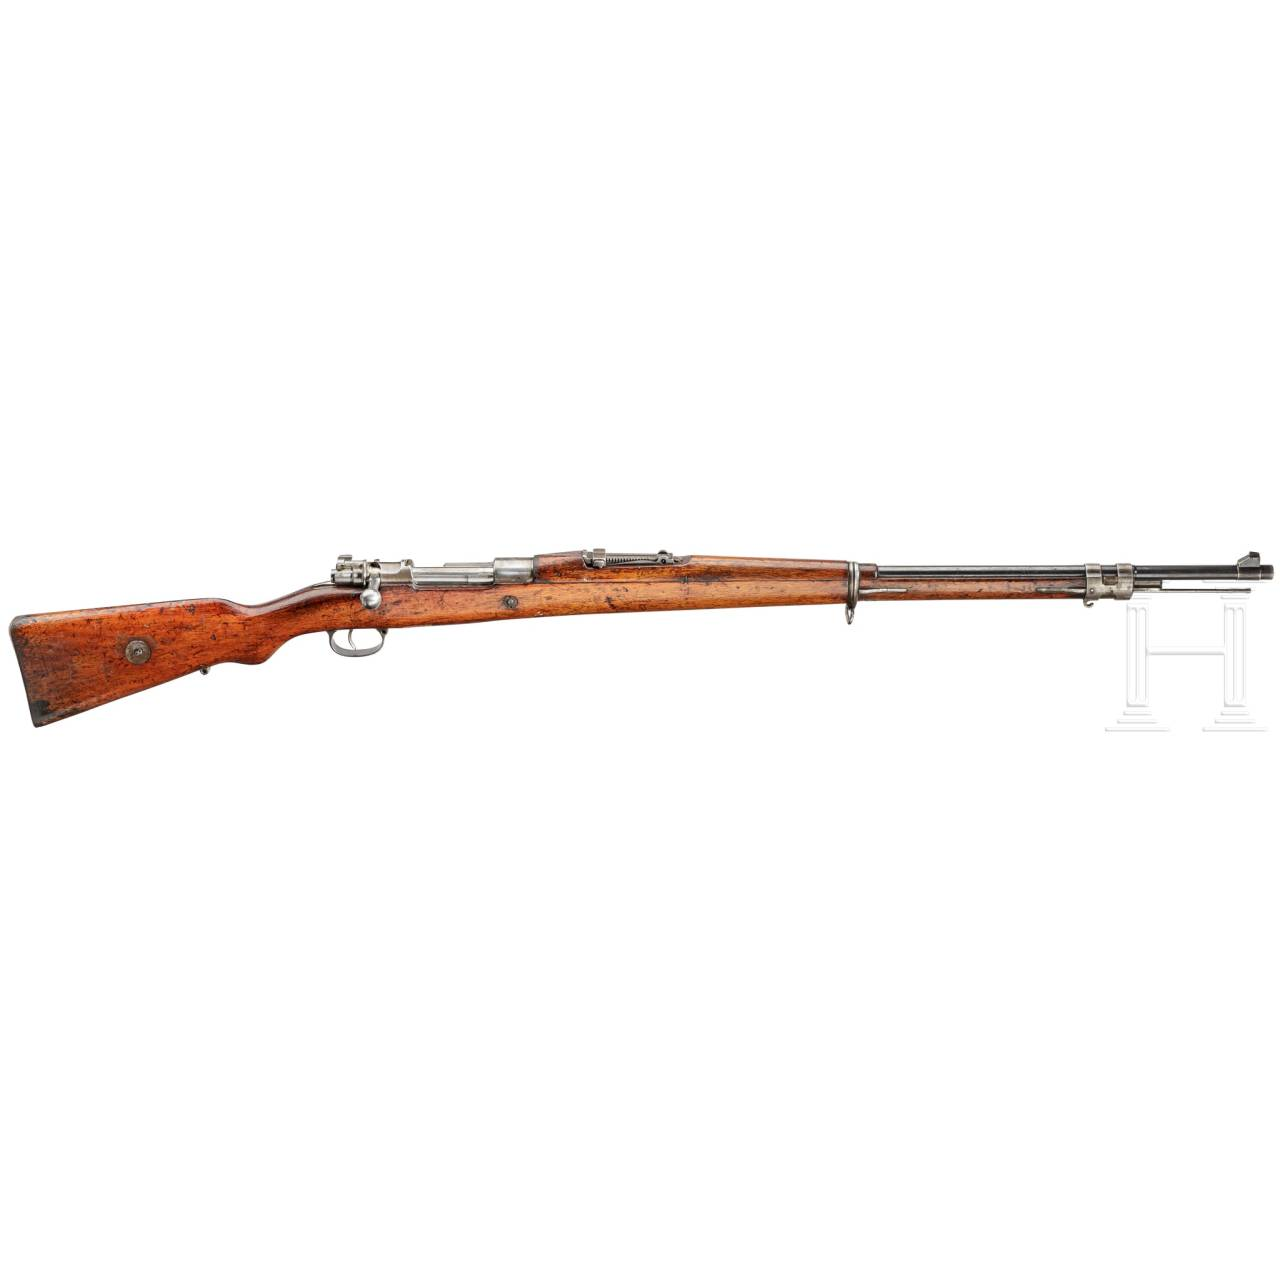 Chile - Gewehr Modelo 1912, Steyr